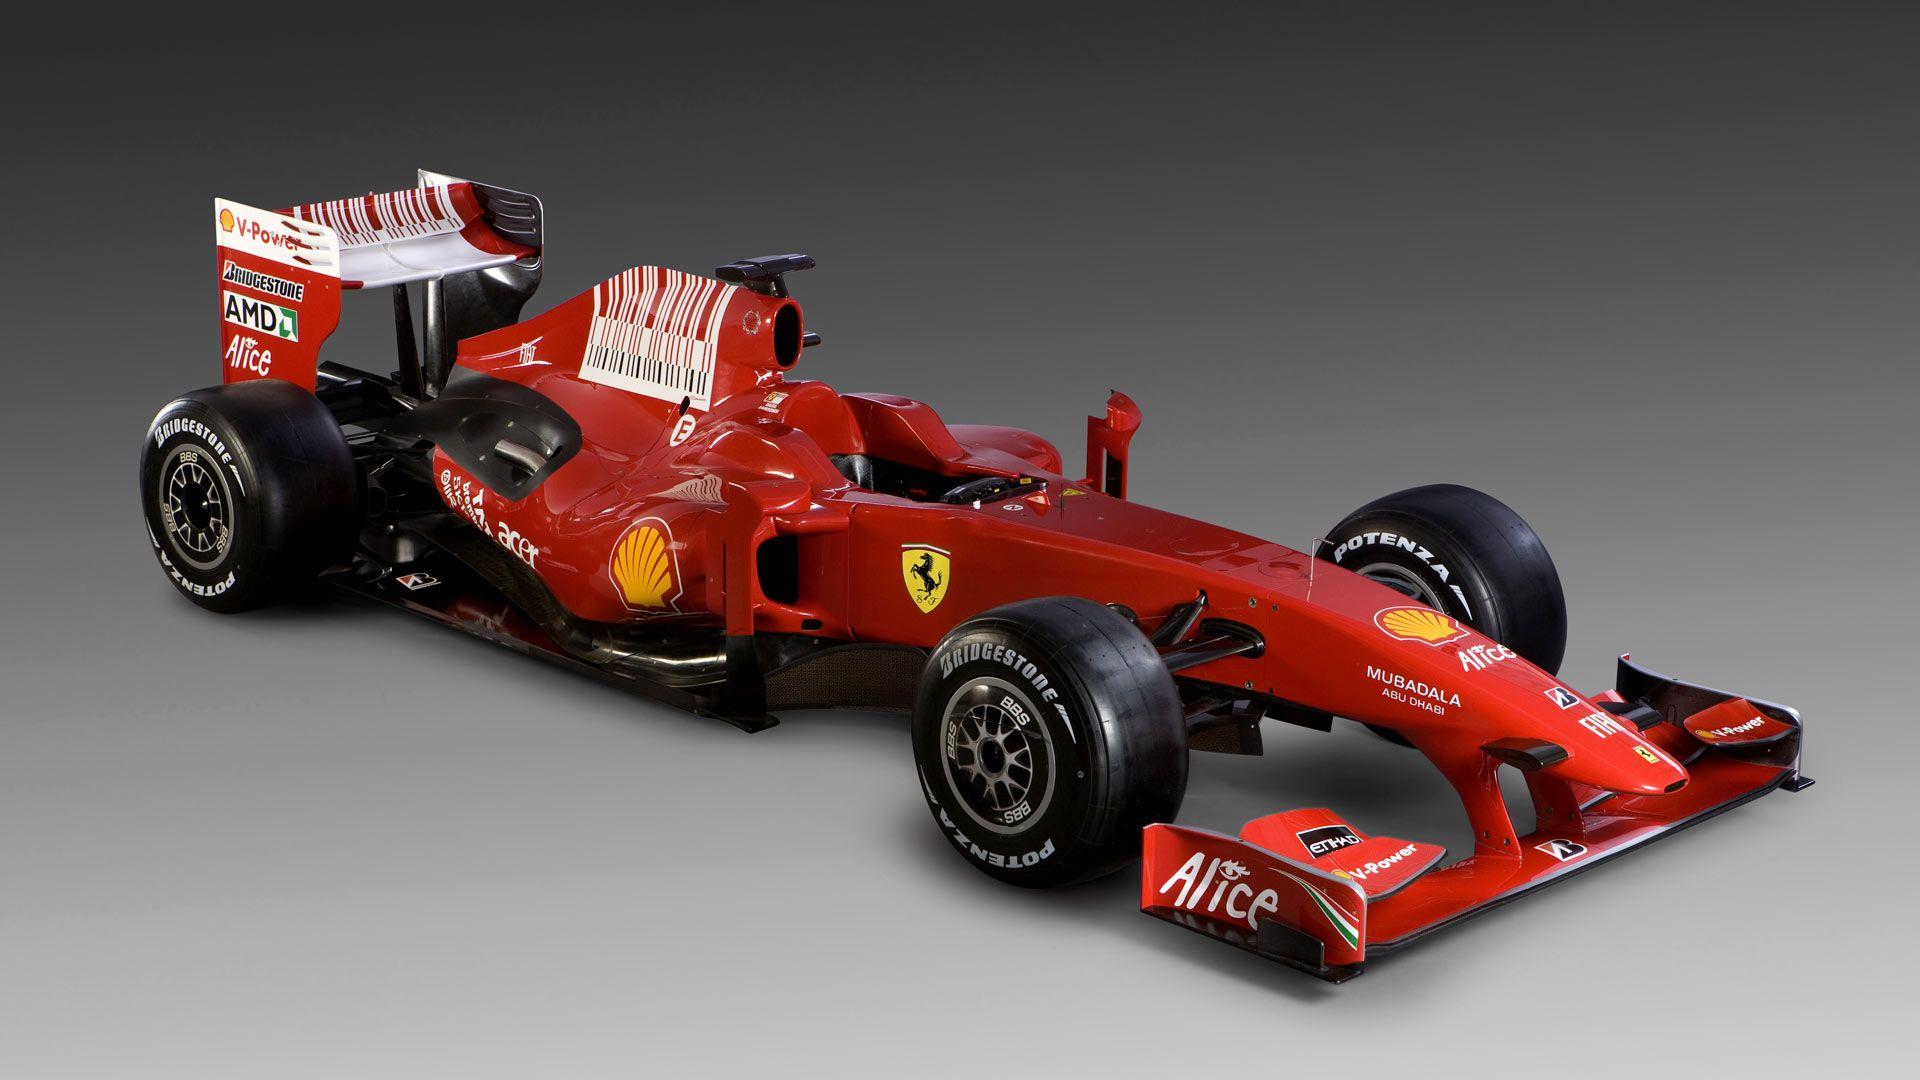 Pin By Wall Lucky On Everything Ferrari Ferrari F1 Ferrari Racing